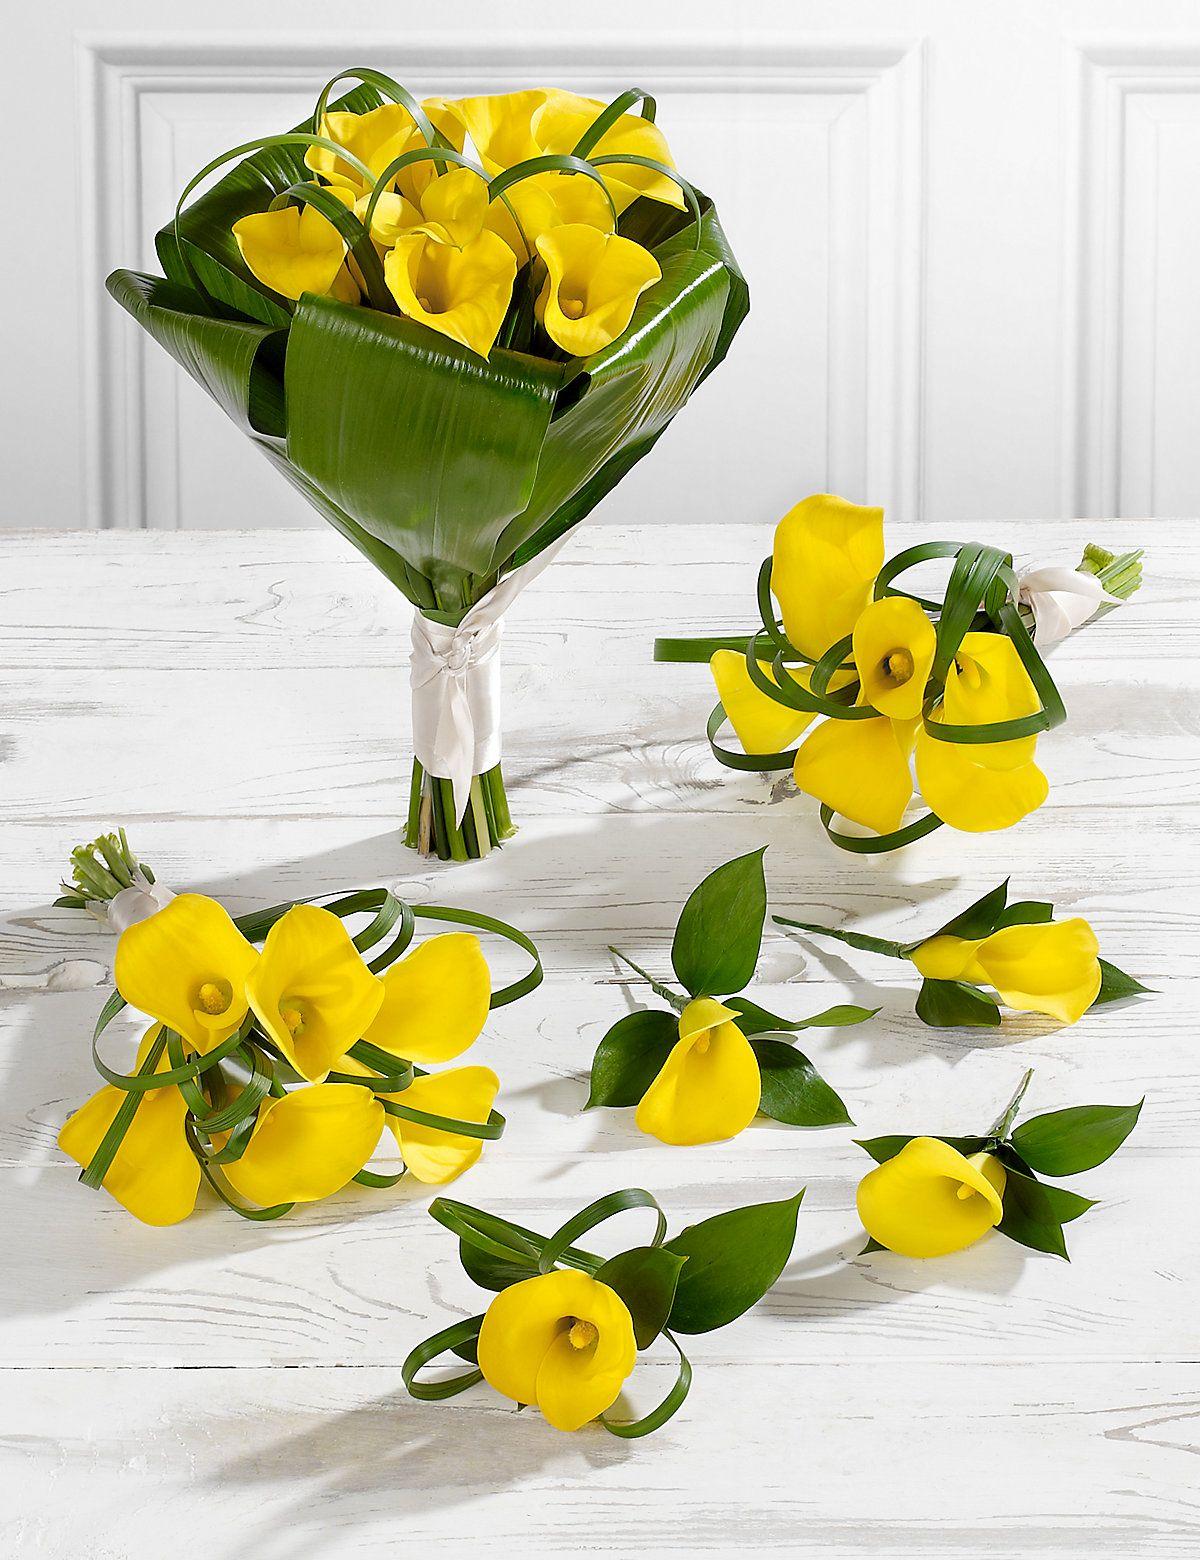 Yellow wedding calla lily collection 2 ms wedding bouquets yellow calla lily wedding flowers collection 2 ms izmirmasajfo